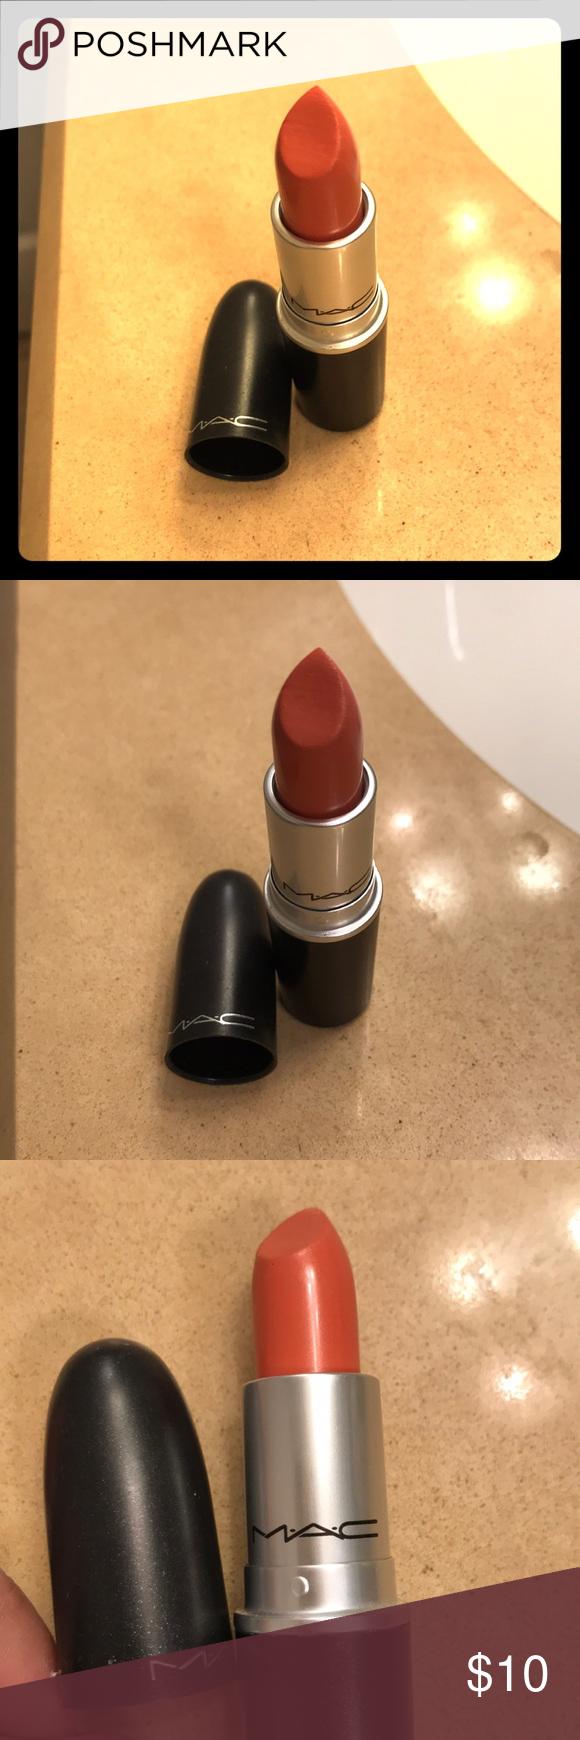 "MAC ""Ravishing"" Lipstick | Mac ravishing, Lipstick, Mac ..."